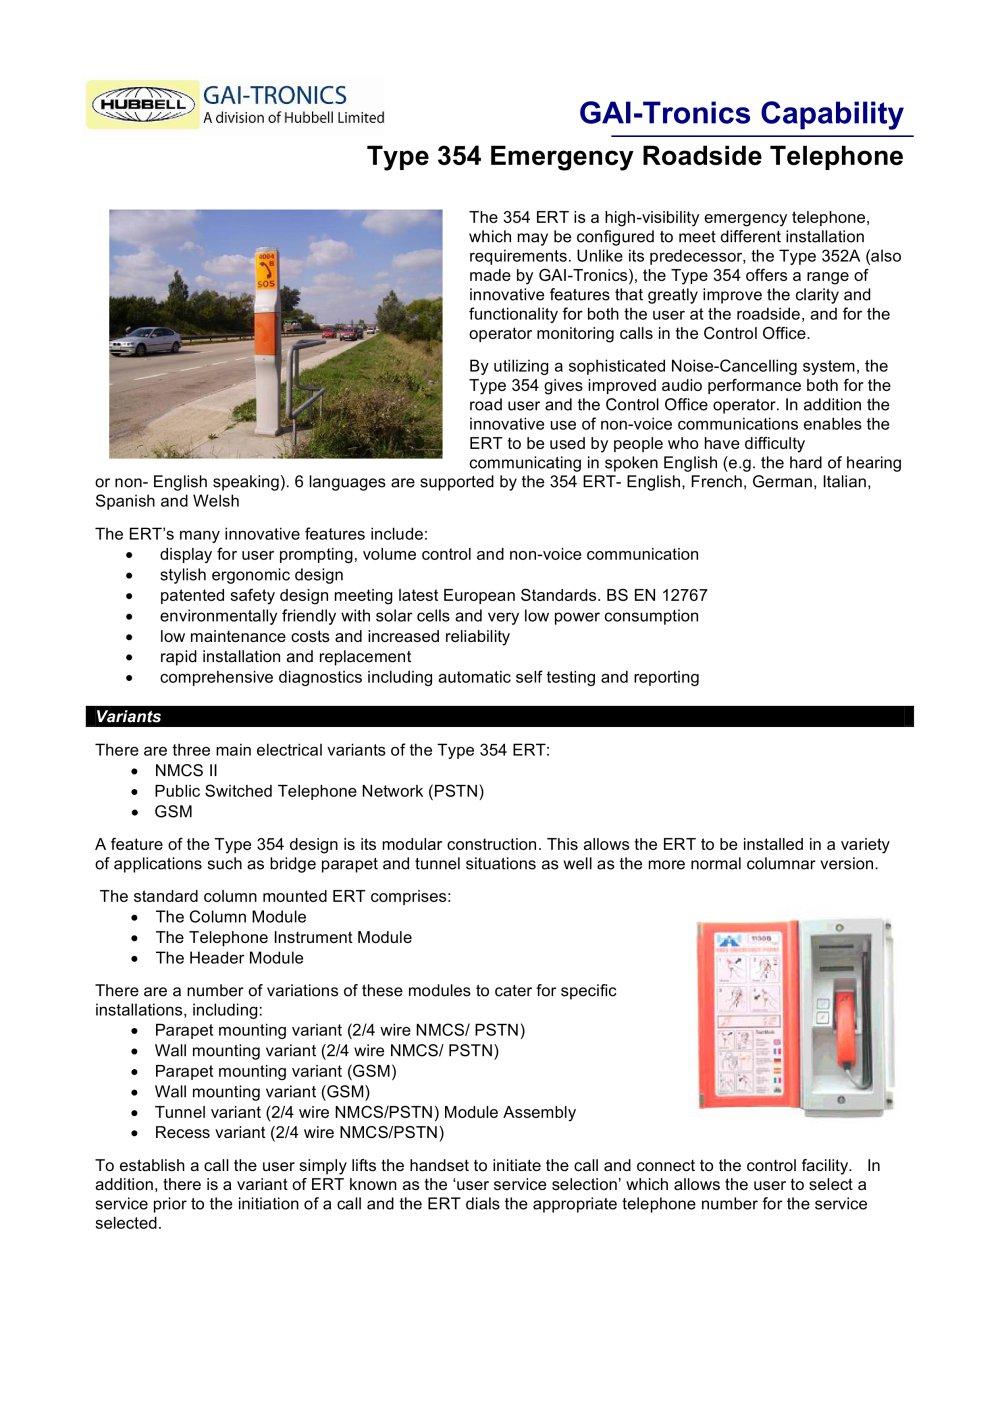 Emergency Roadside Telephone: Type 354 (ERT) - GAI-Tronics a ...